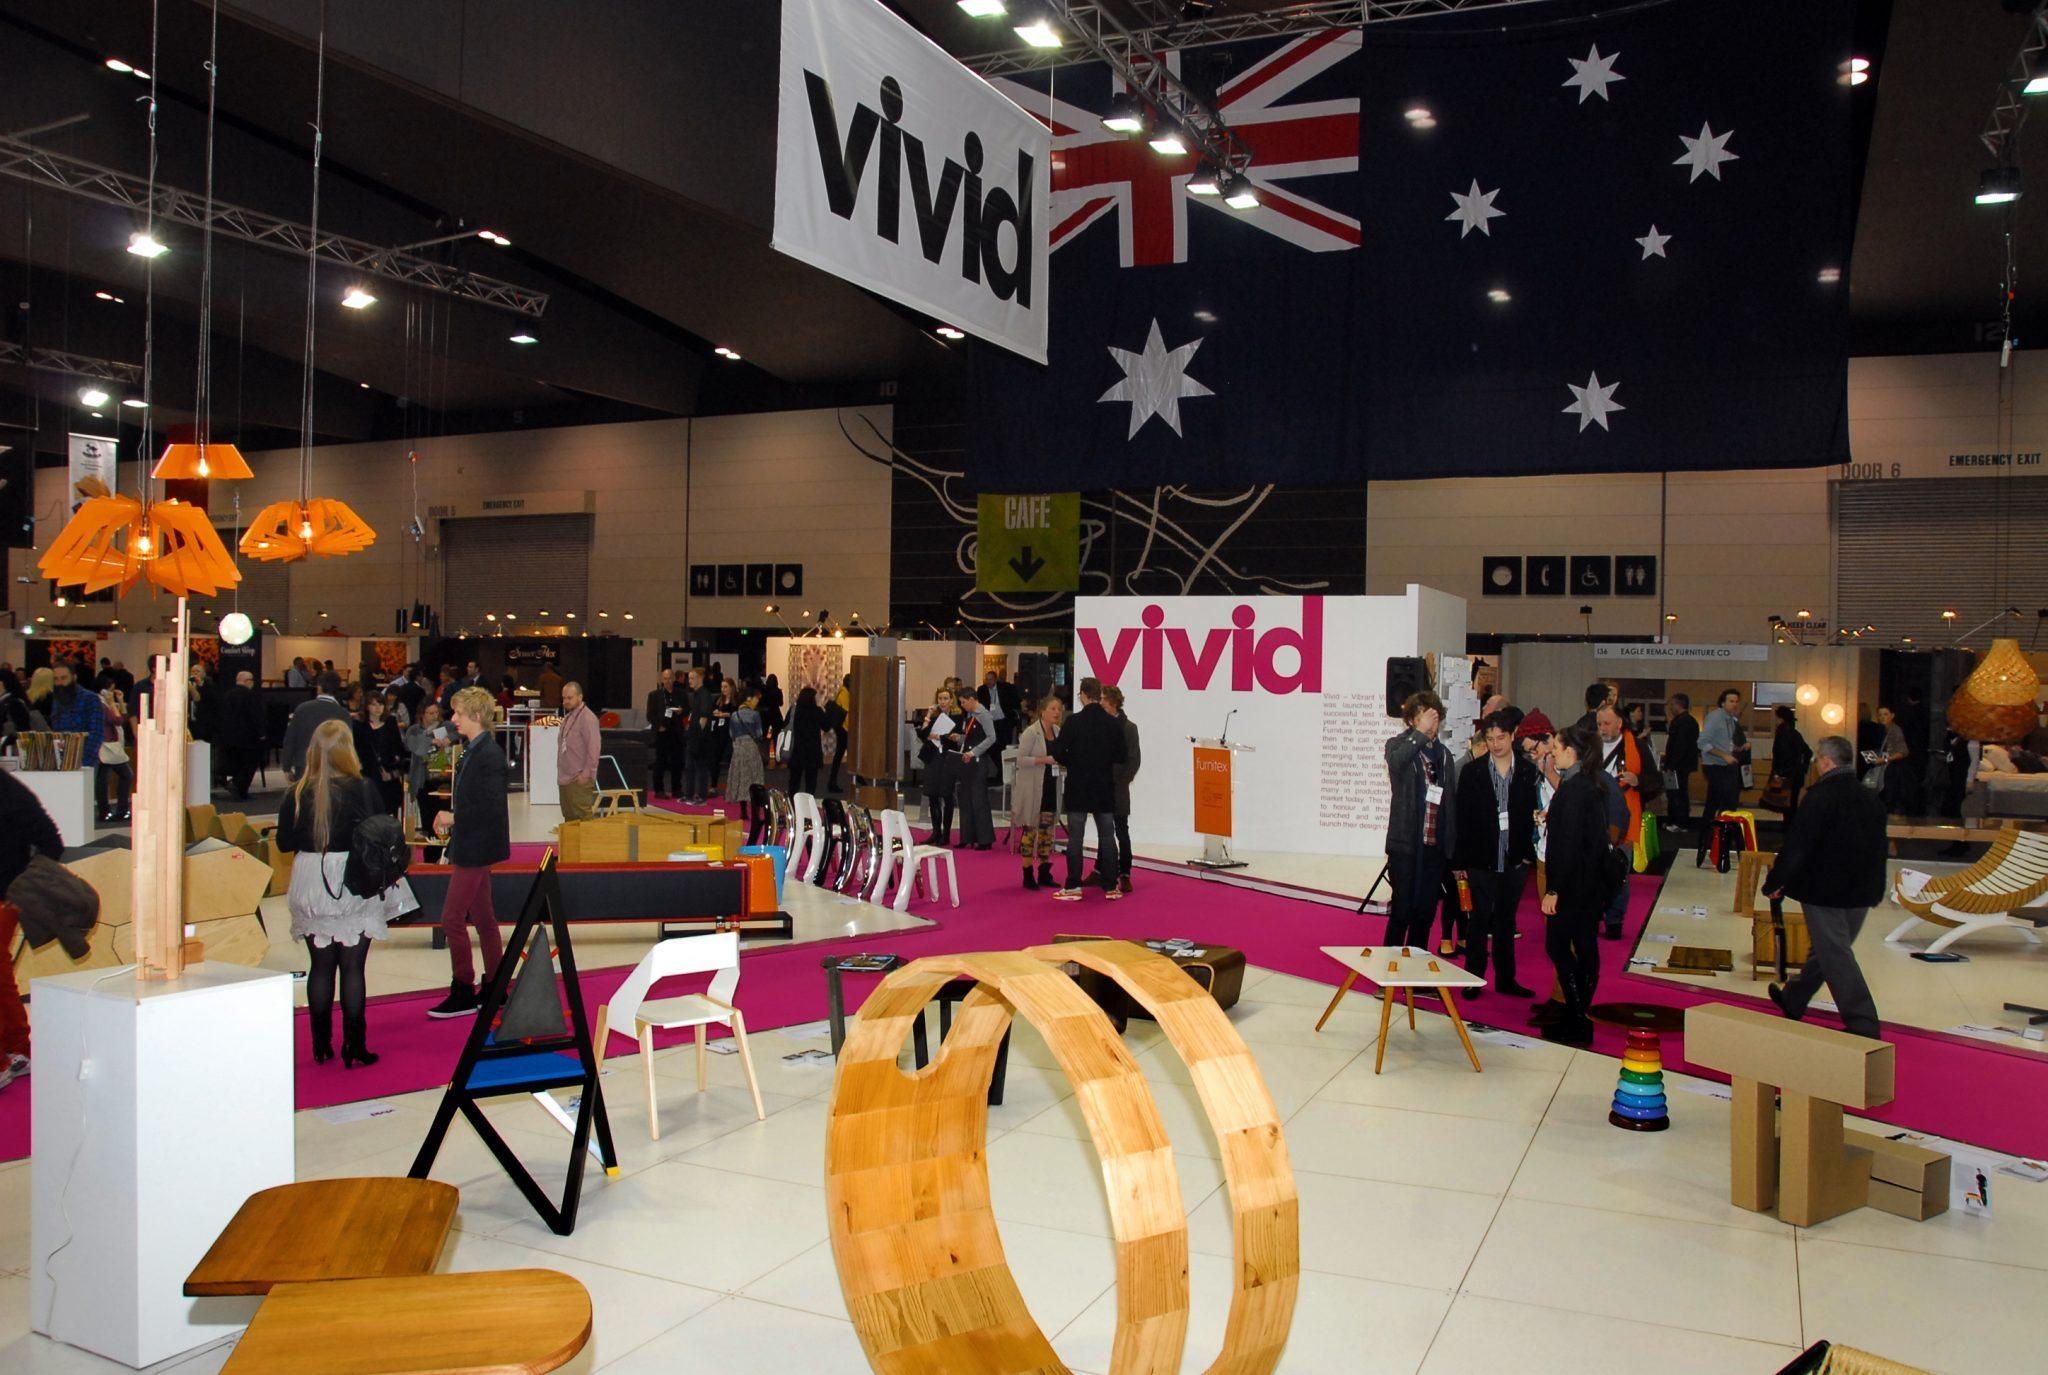 VIVID 2012